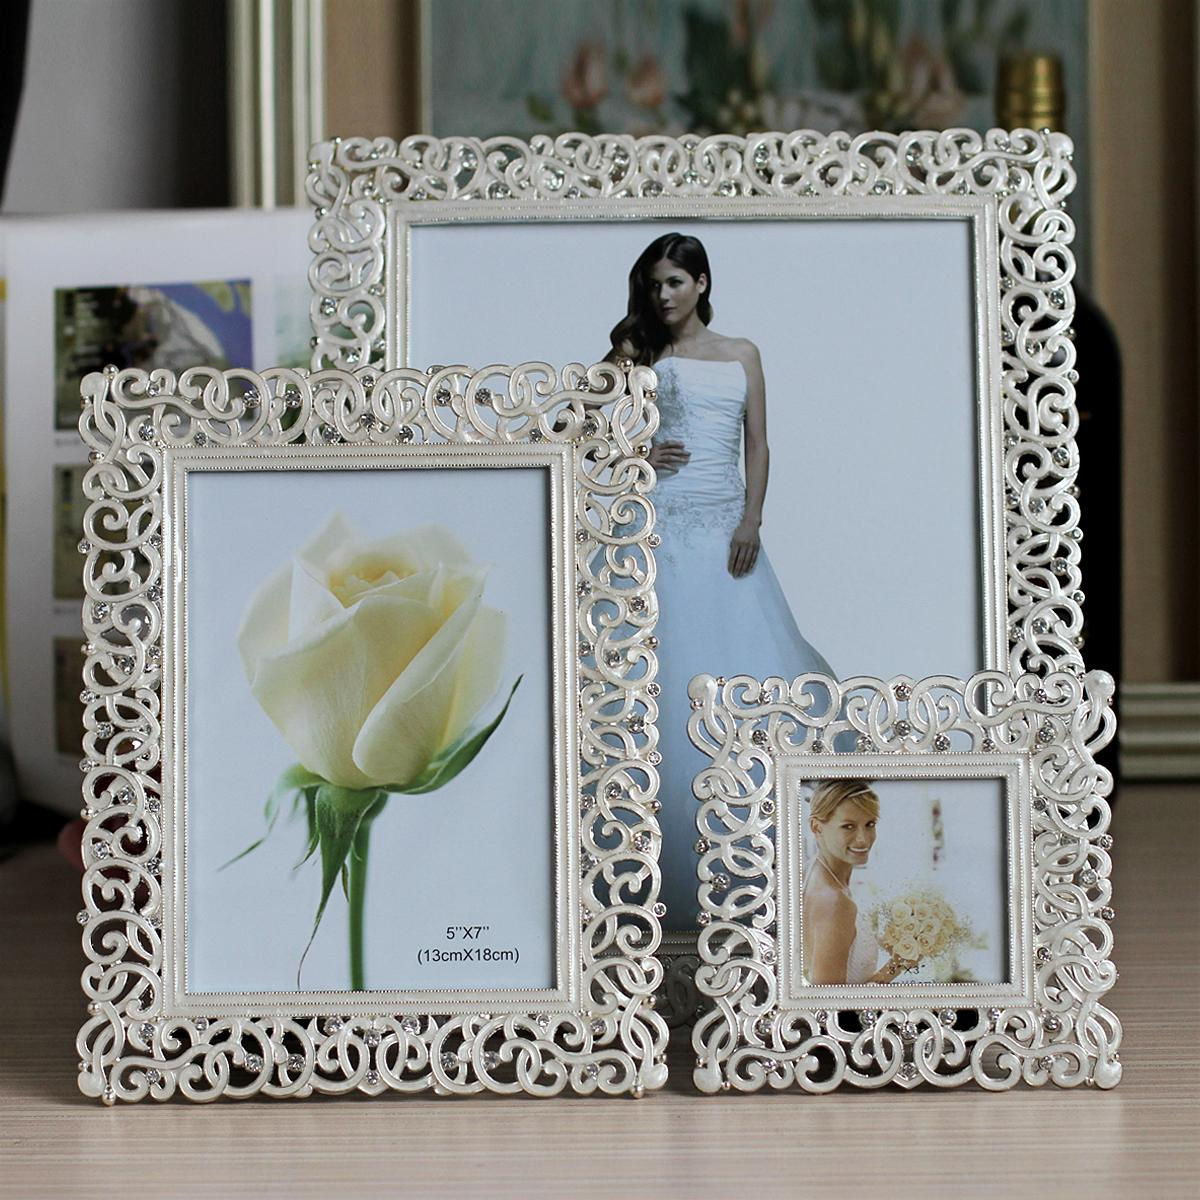 3 6 7 10inch Metal Diamond Frame Wedding Dress Swing Photo